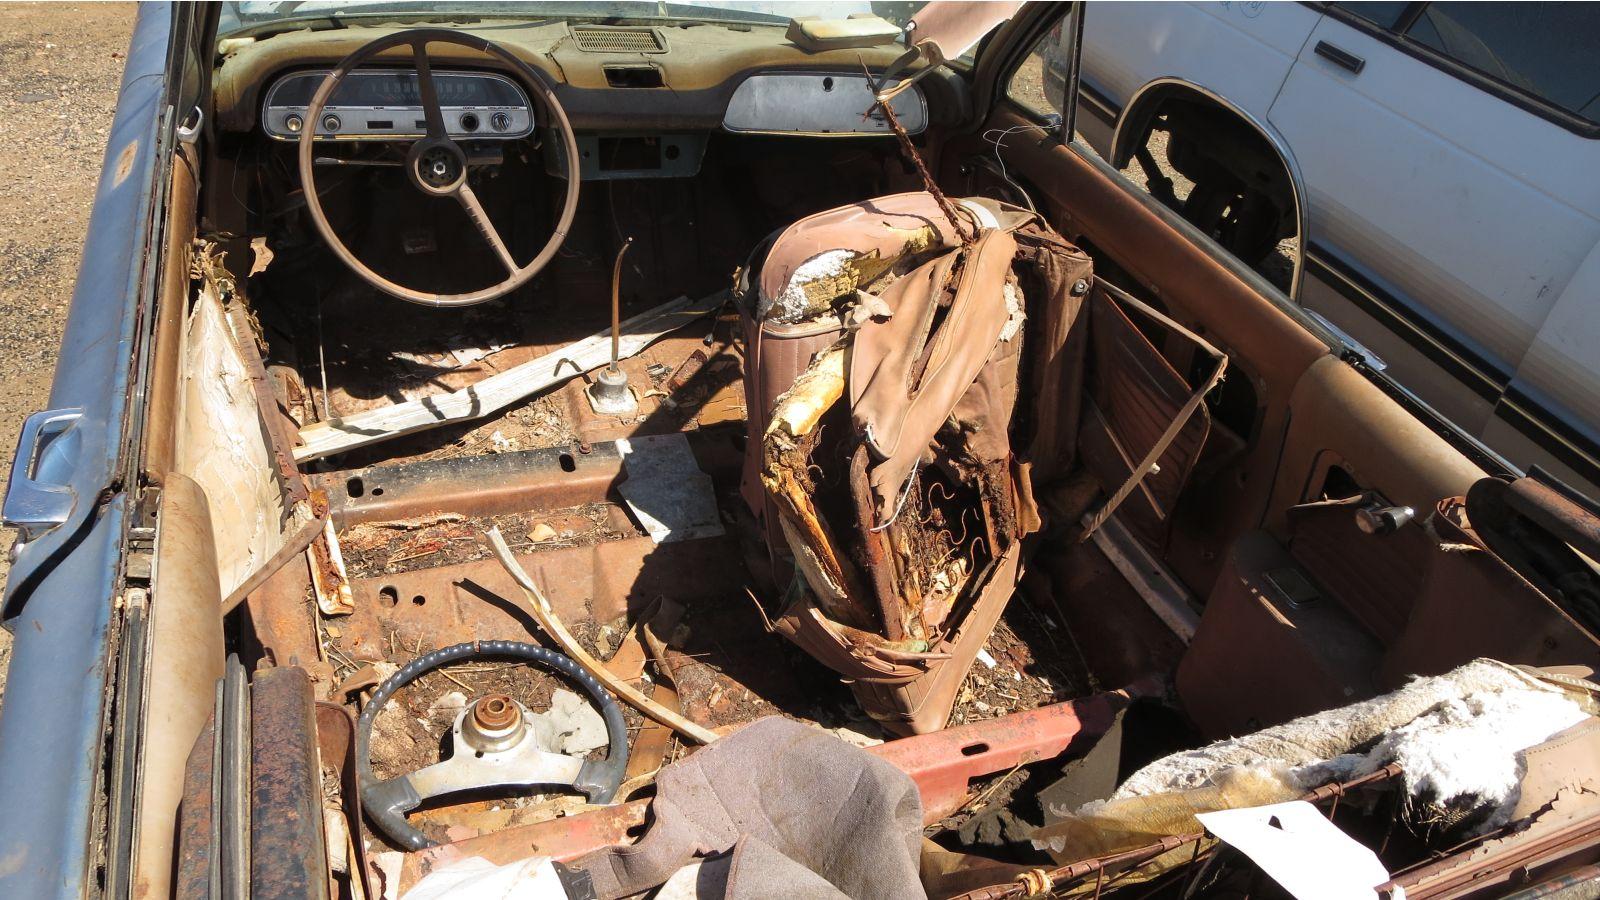 1964 Chevrolet Corvair convertible in Colorado wrecking yard